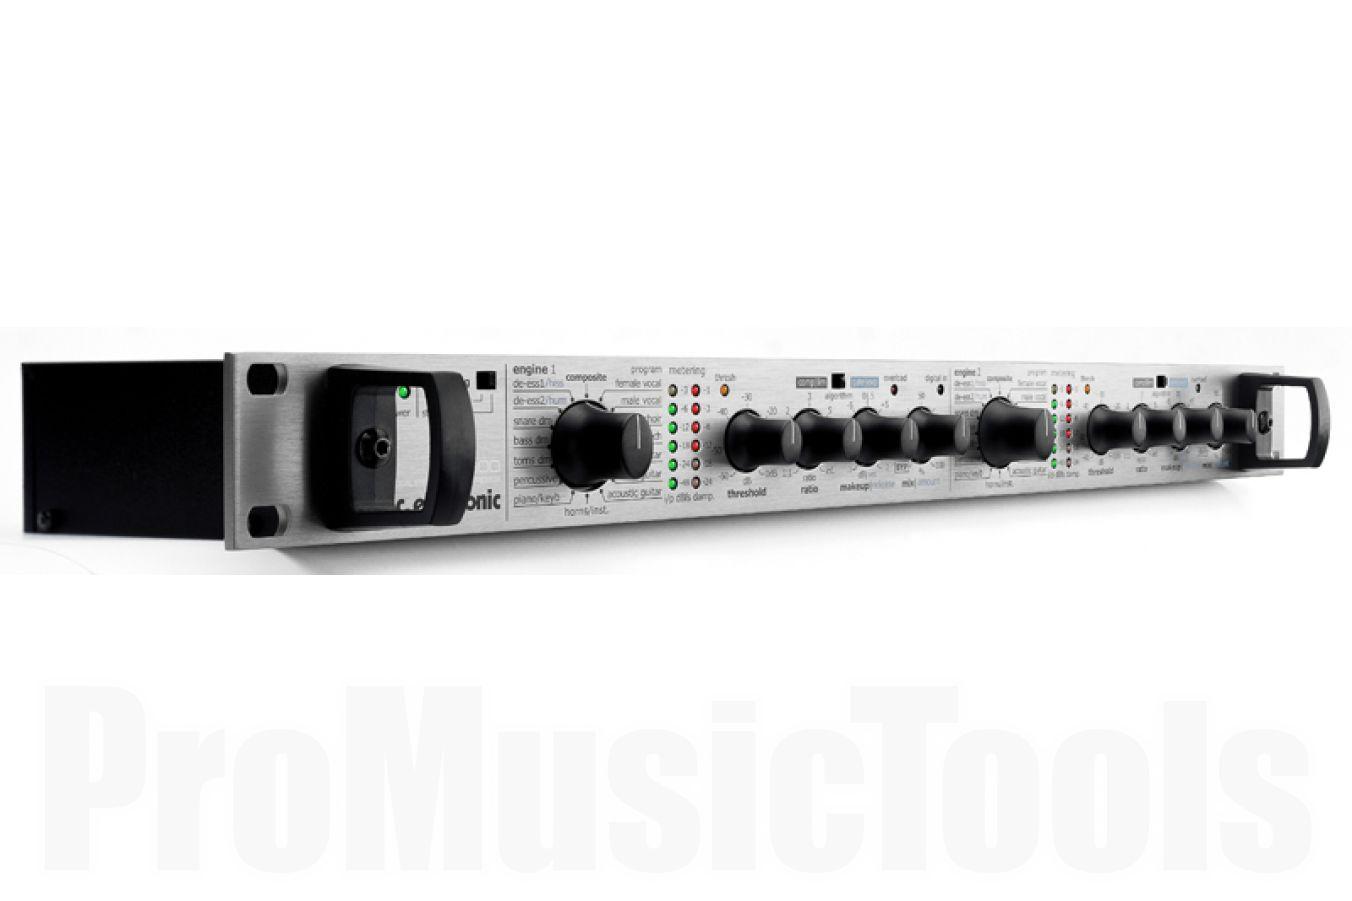 TC Electronic C300 - b-stock (1x opened box)